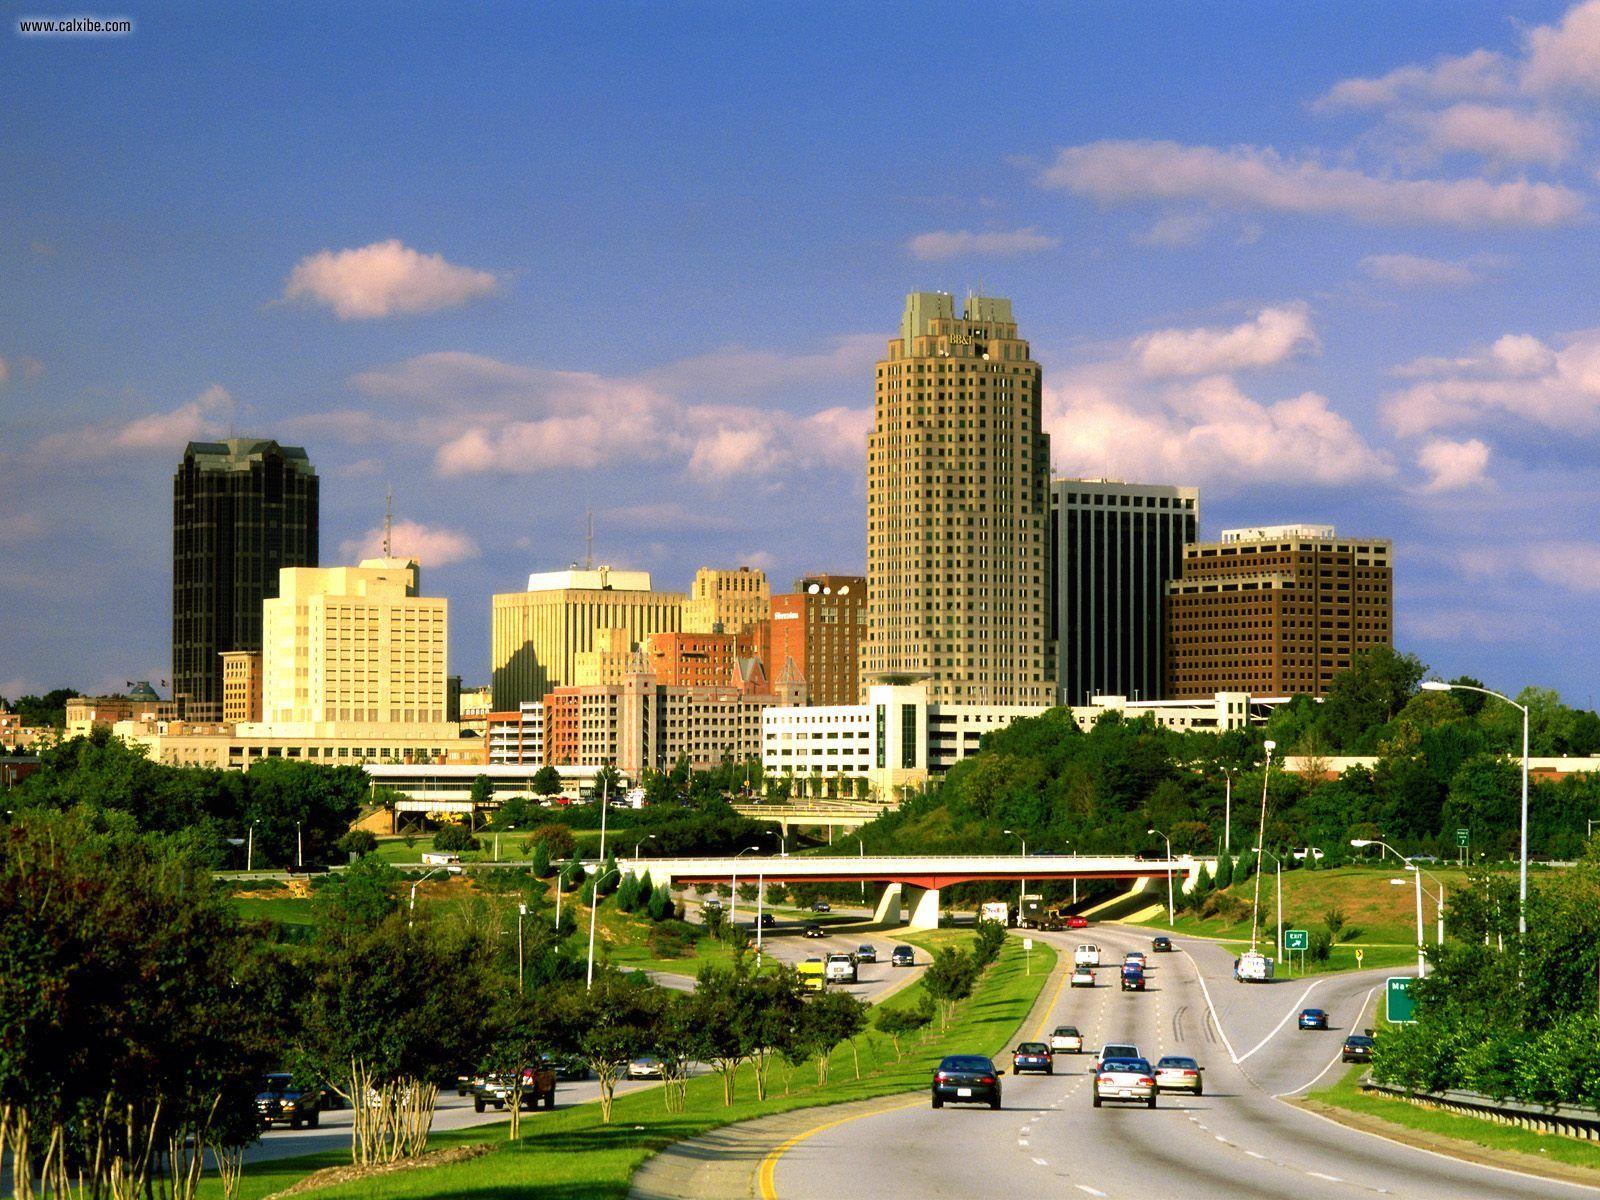 Stephens Family NC: Traveling to North Carolina (Part 3)